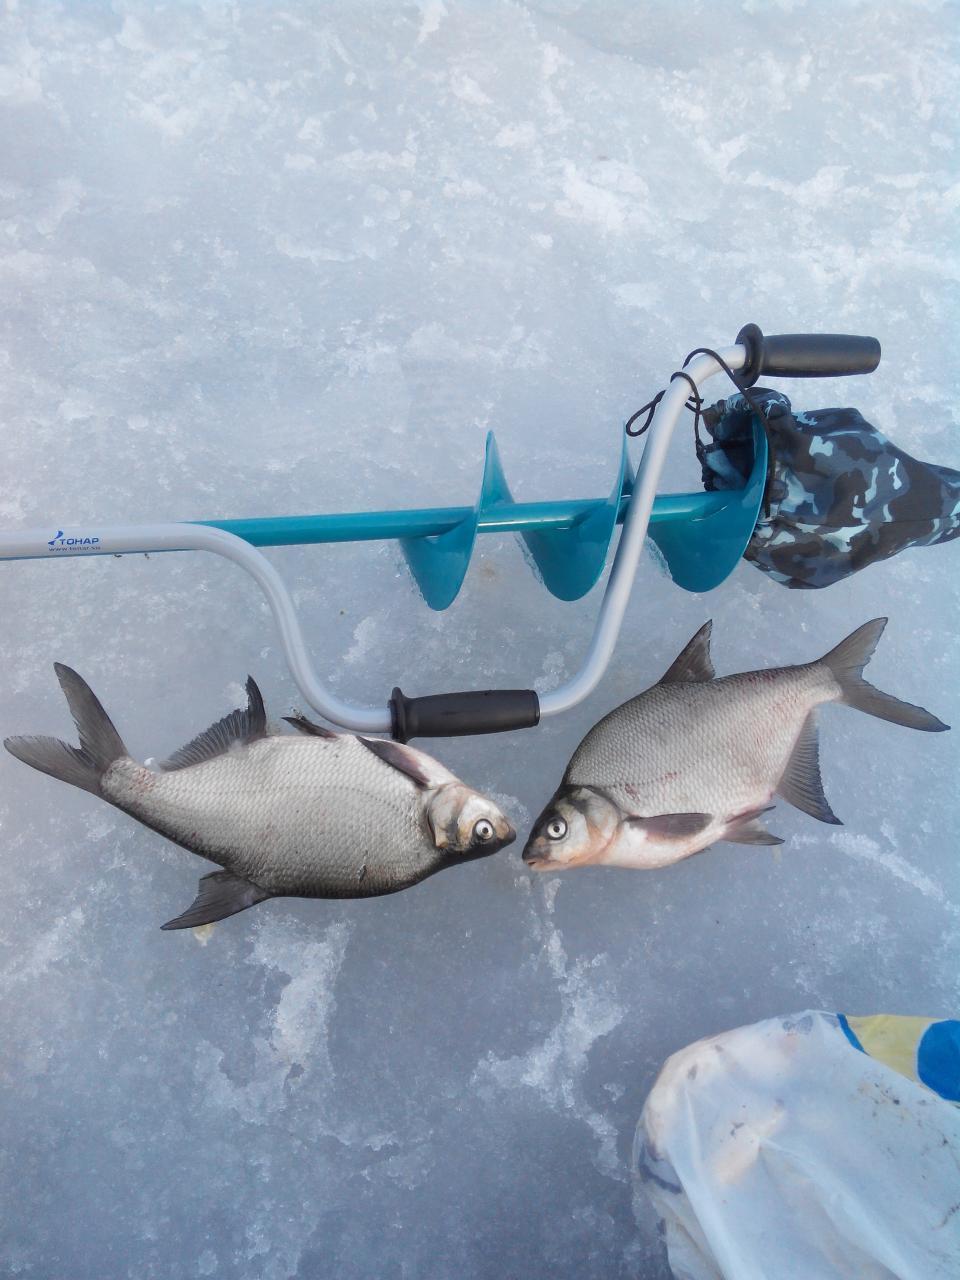 В субботу хотел рвануть на ЛЭП но там ... | Отчеты о рыбалке в Беларуси